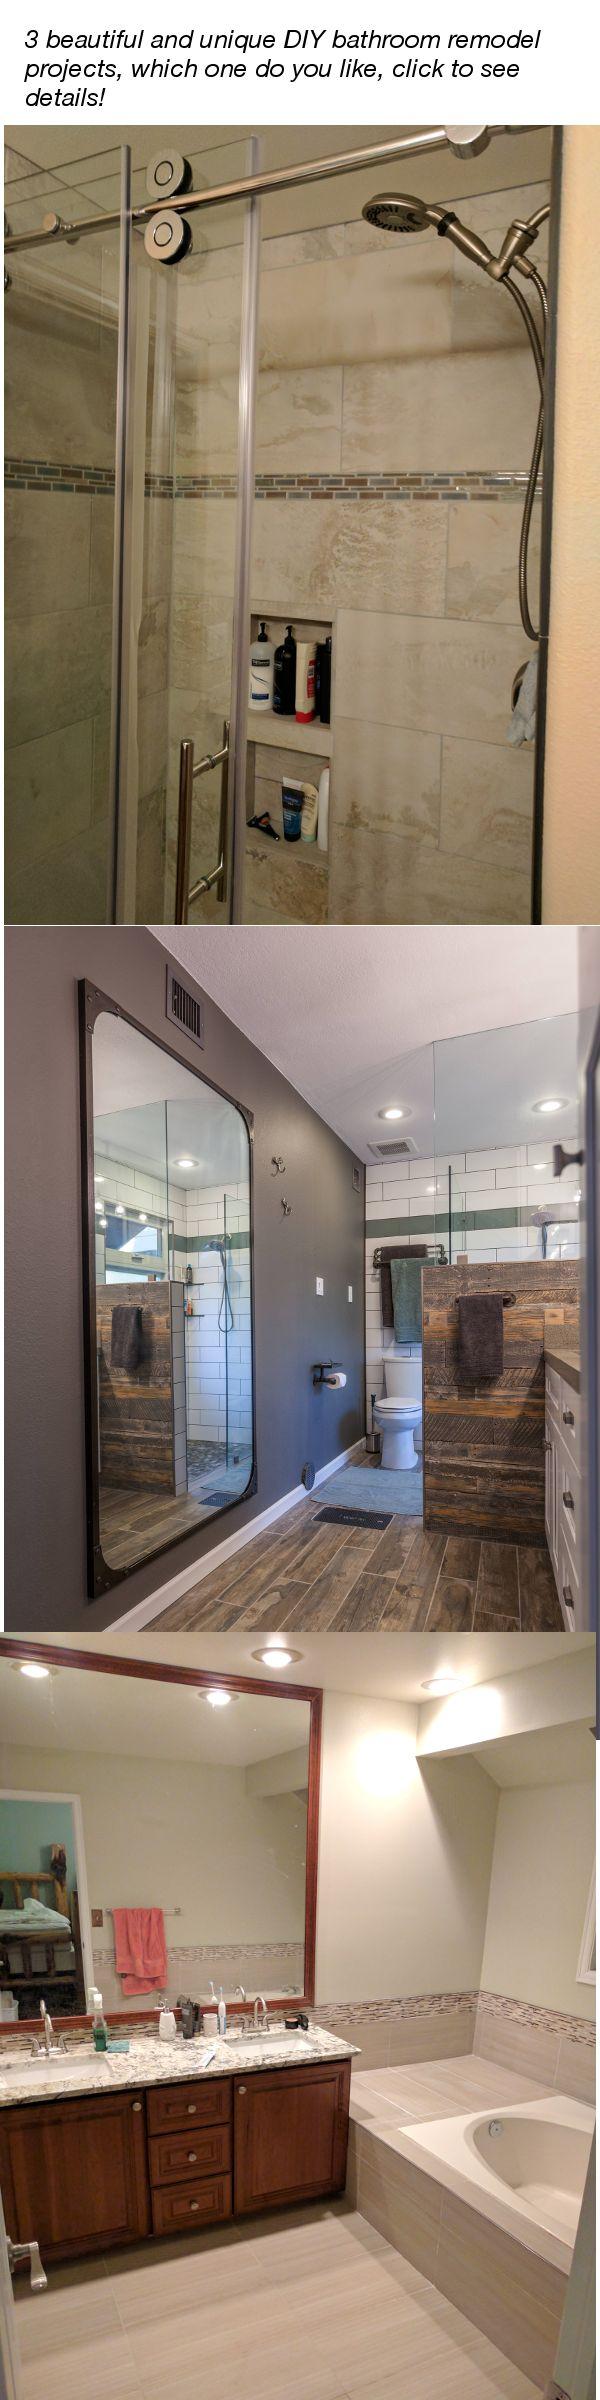 Bathroom Remodel App 4861 best bathroom remodel images on pinterest